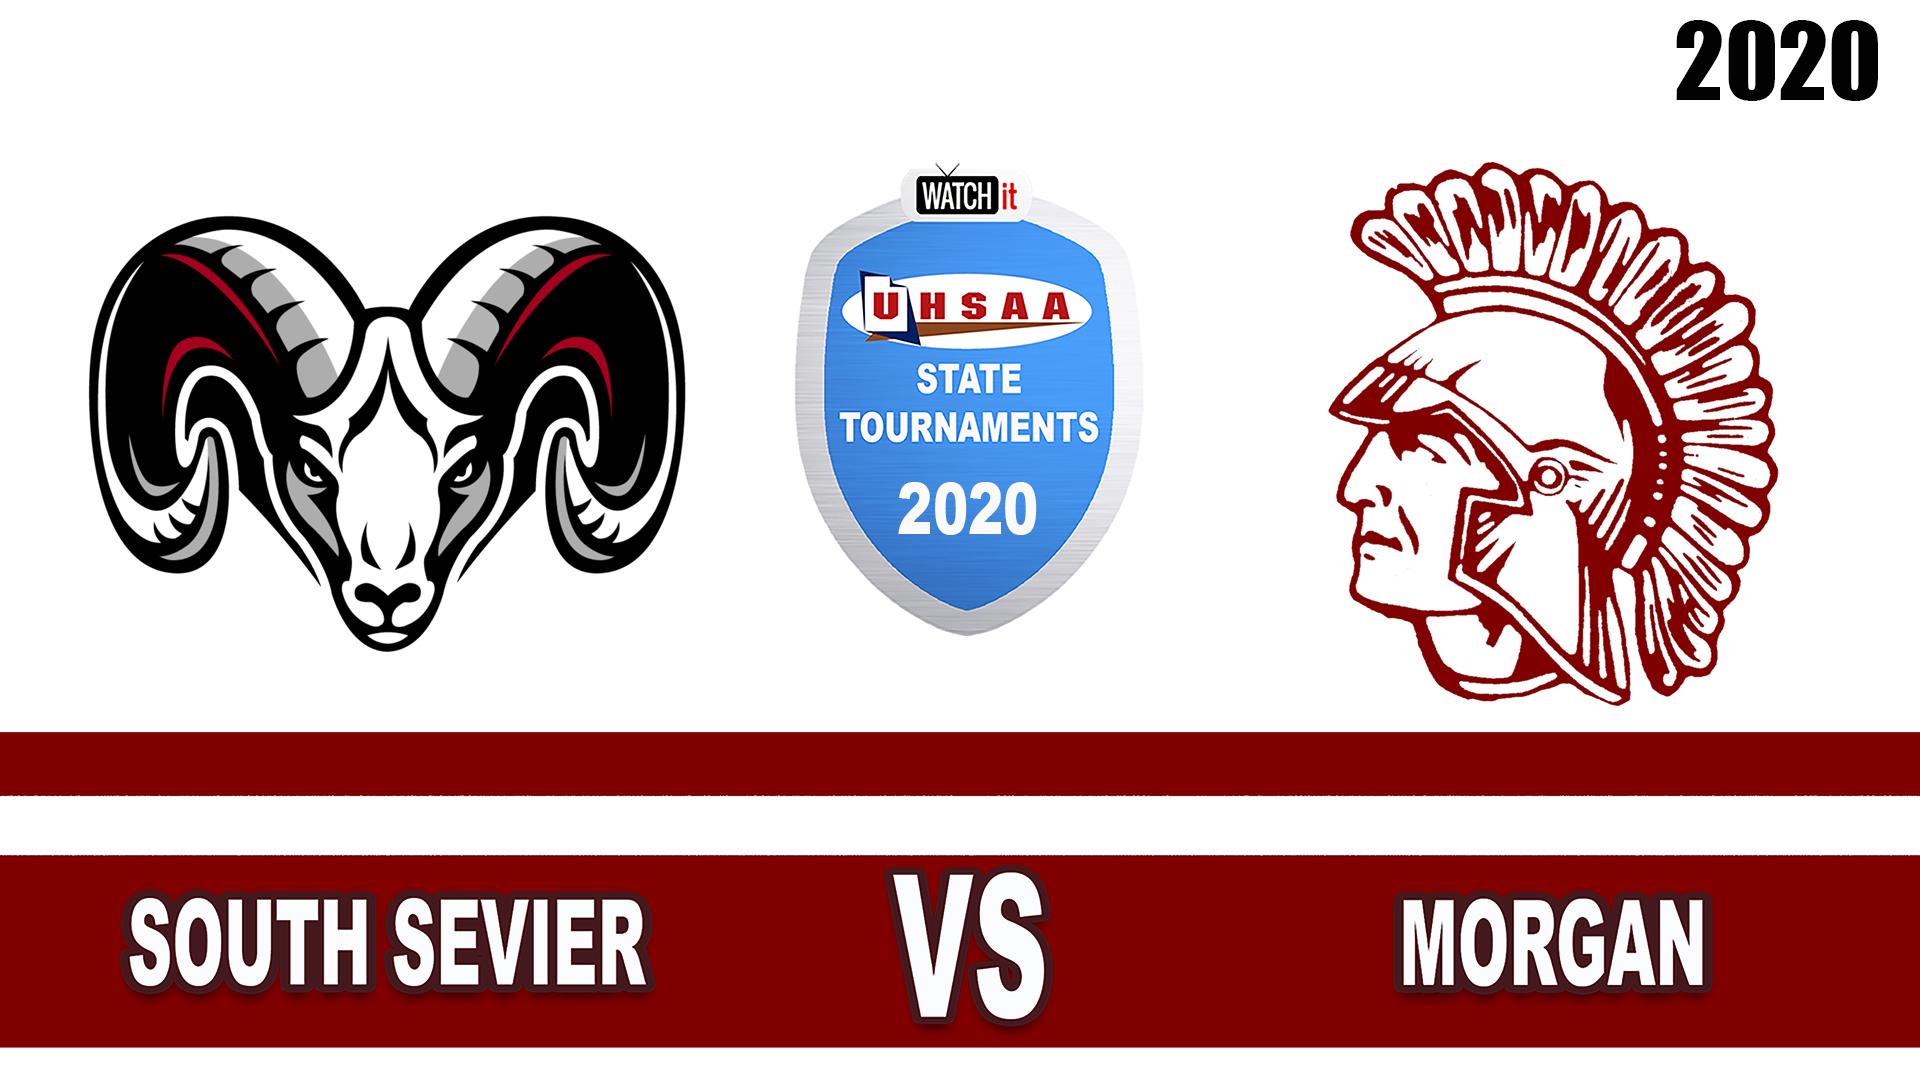 South Sevier vs Morgan